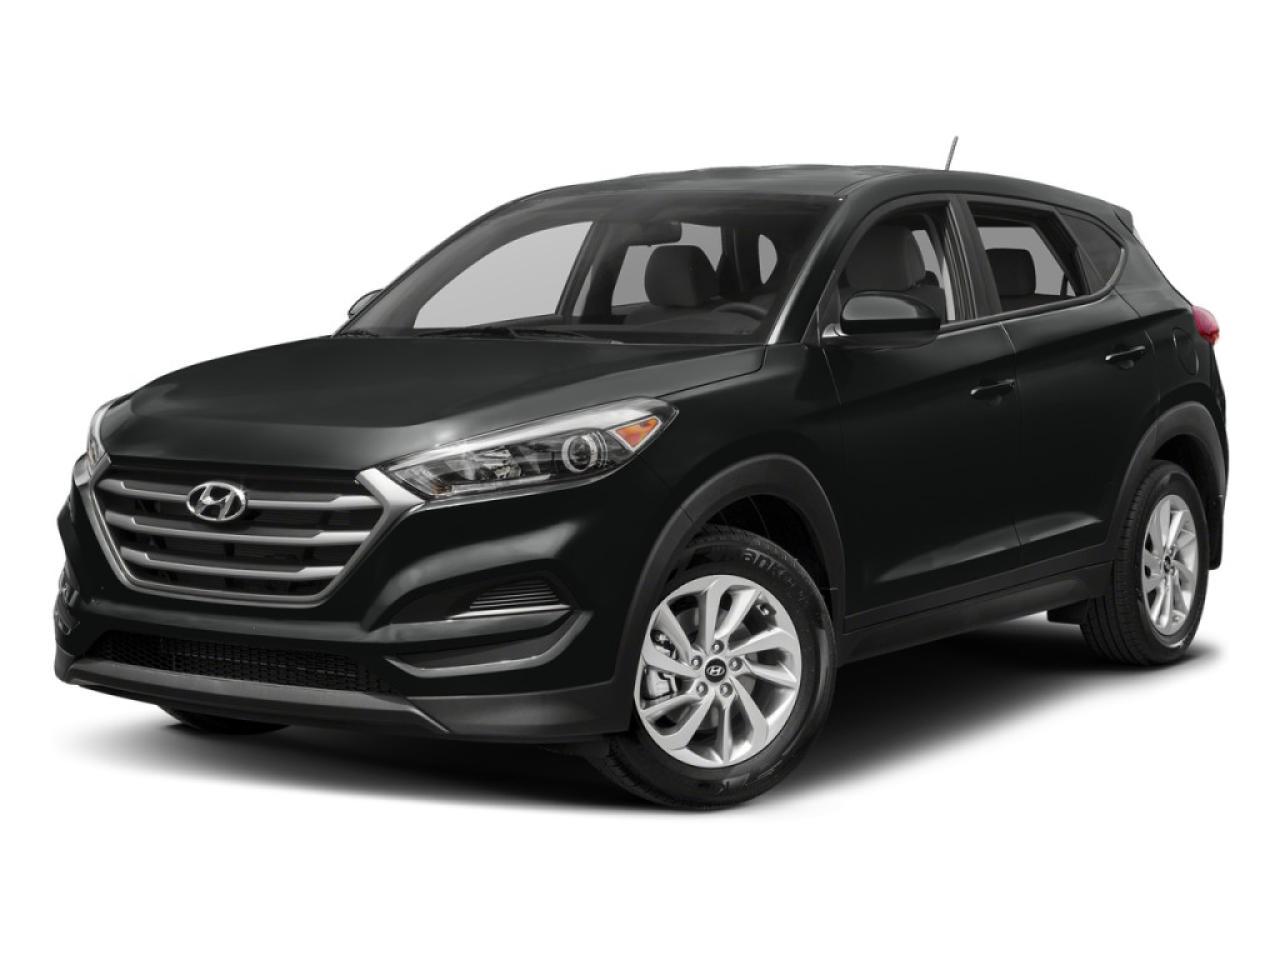 2018 Hyundai Tucson 1.6T AWD Ultimate NO OPTIONS